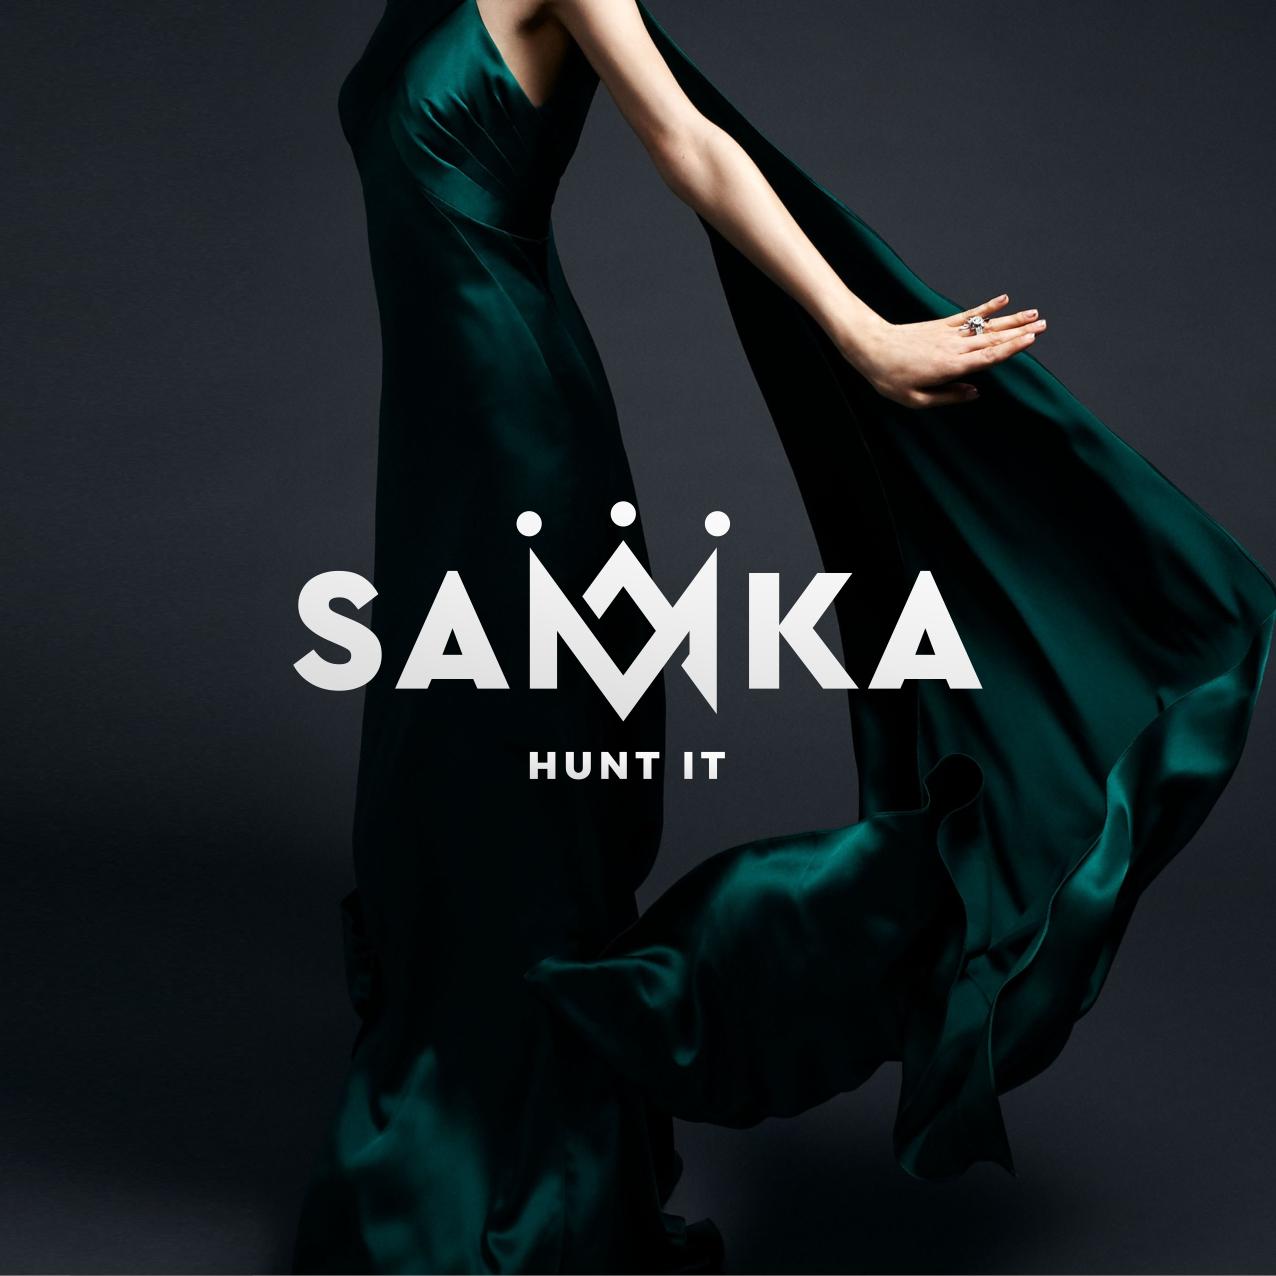 Розробка fashion-бренду SamKa